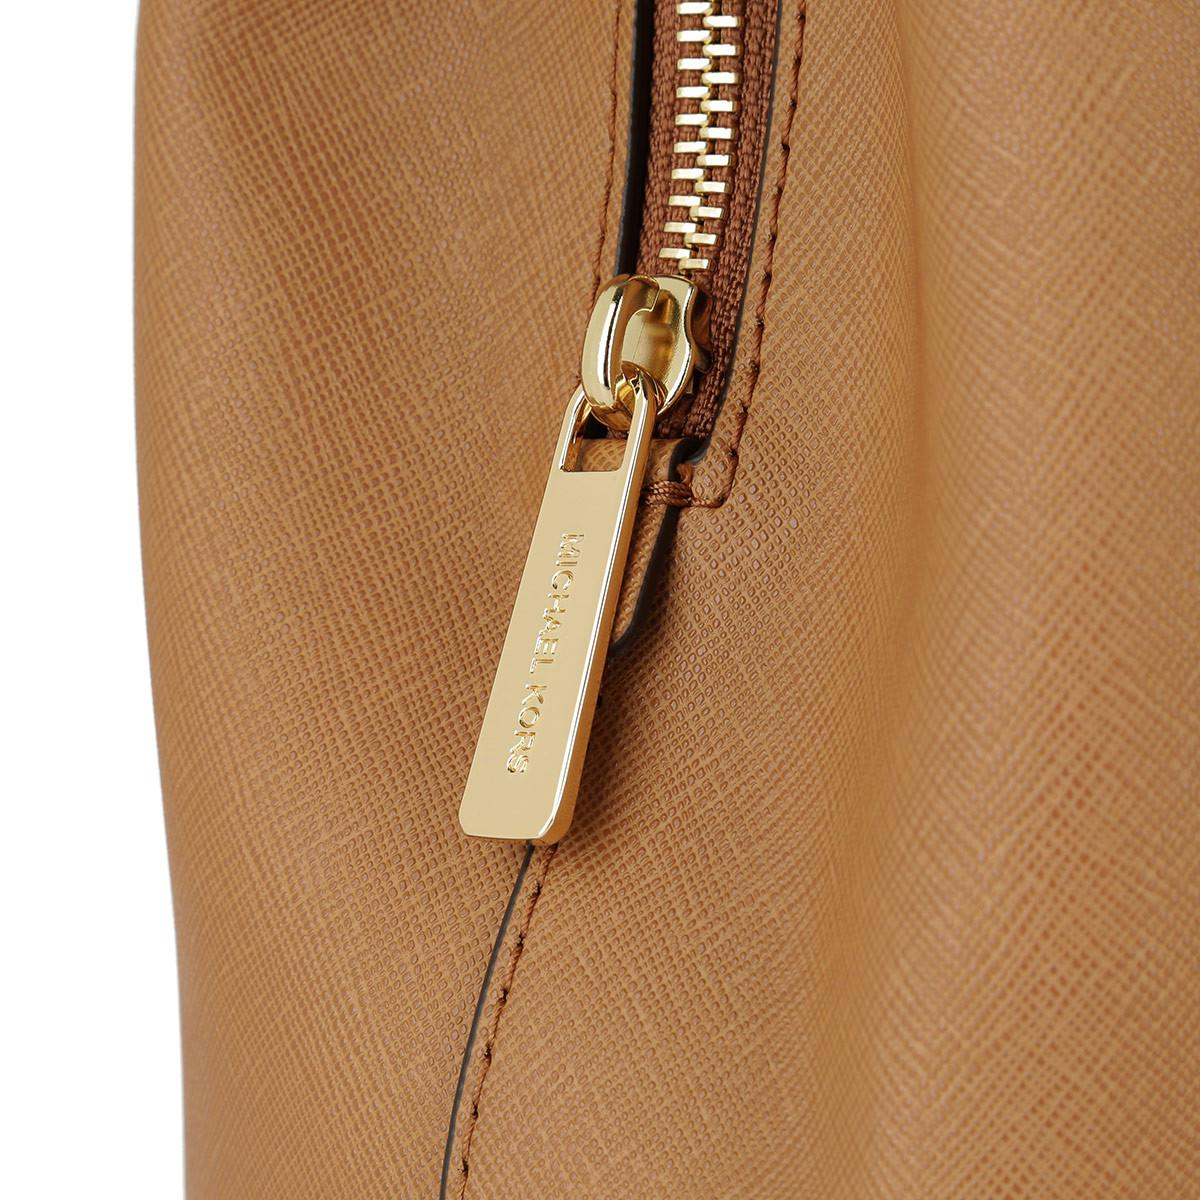 25356da19e7fc2 Michael Kors Savannah Lg Leather Satchel Acorn in Brown - Lyst